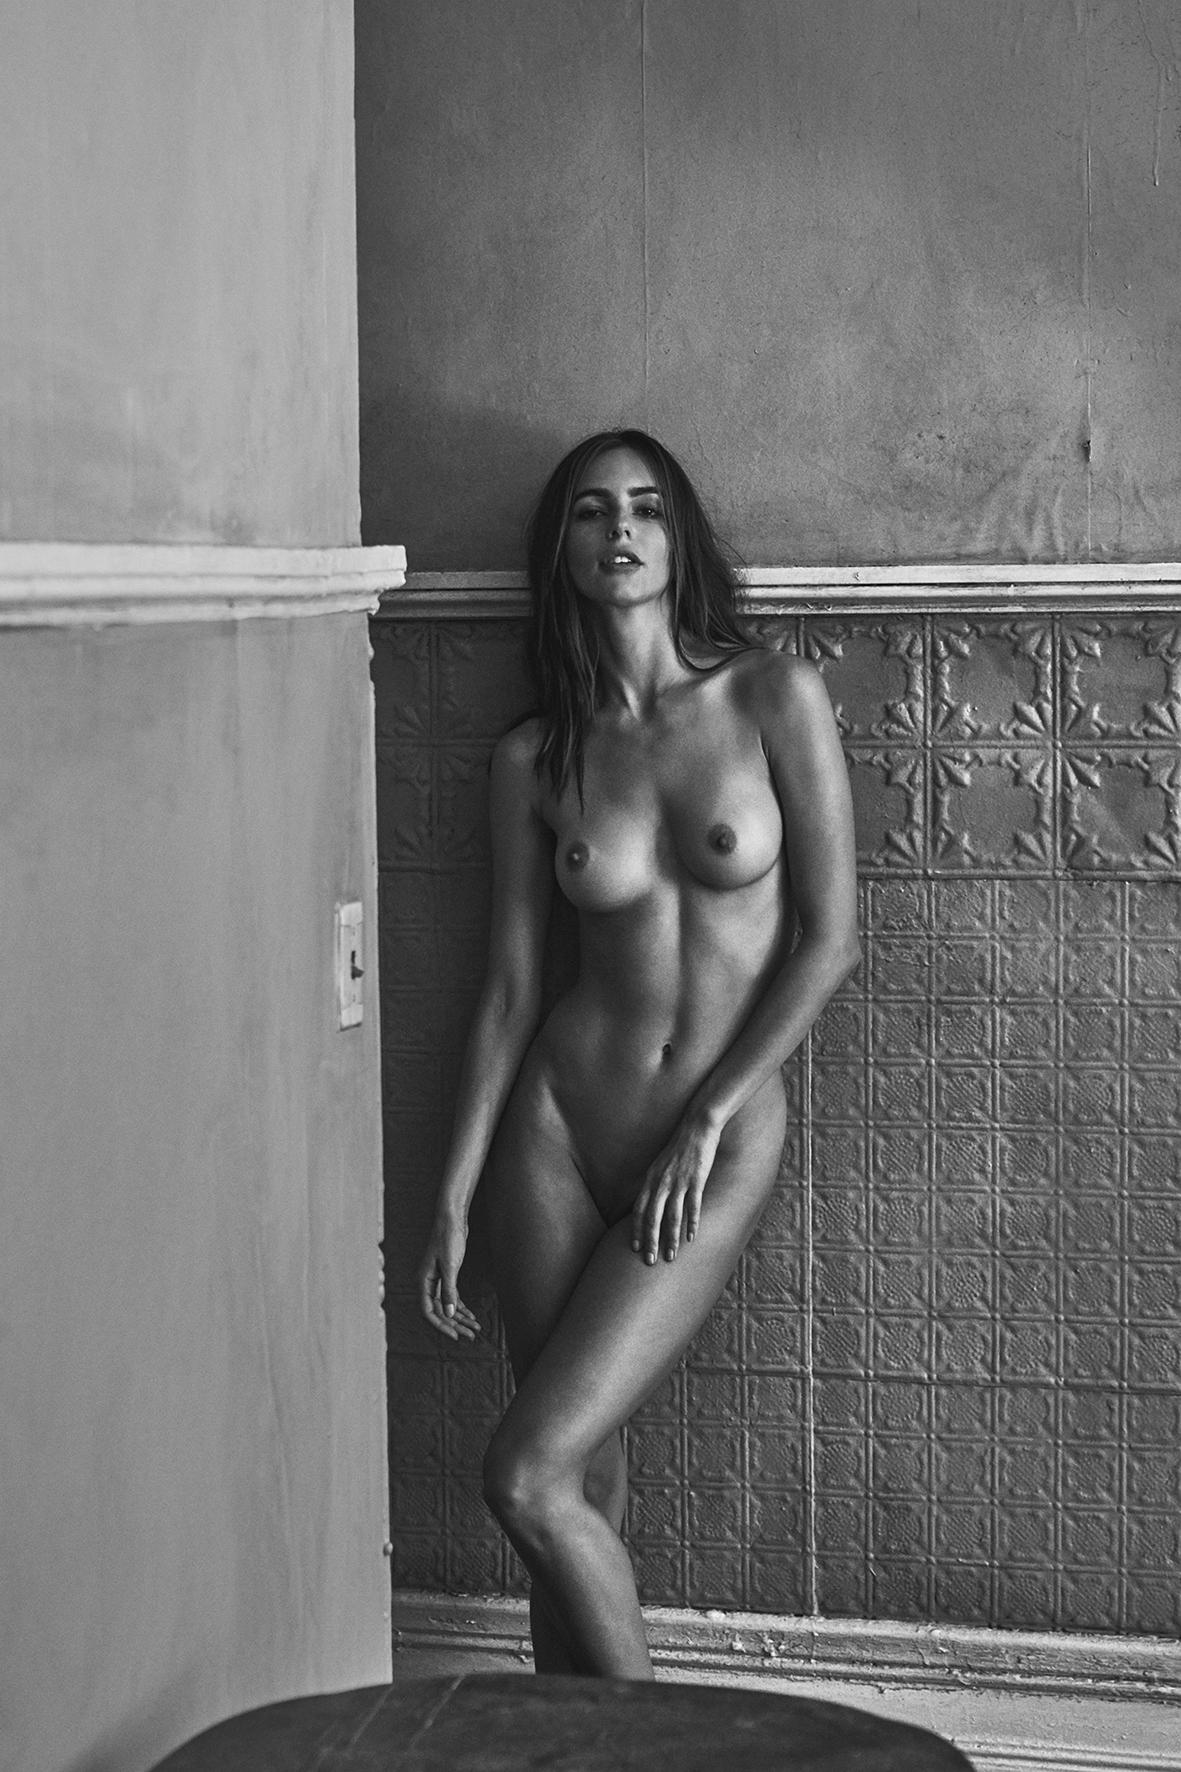 Amanda Pizziconi - Stefan Rappo photoshoot